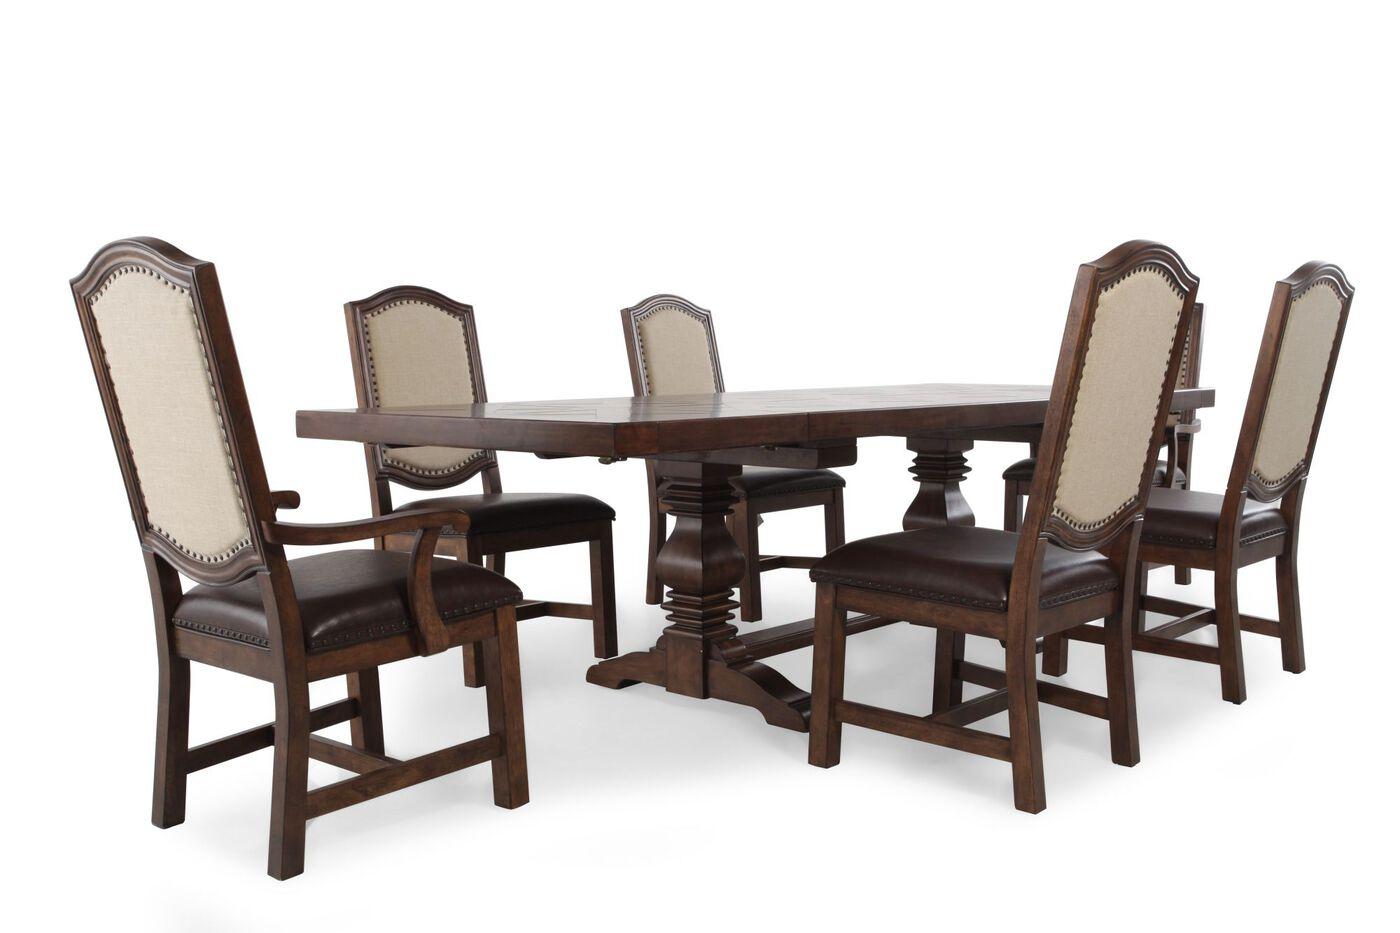 samuel lawrence american attitude seven piece dining table: seven piece dining set